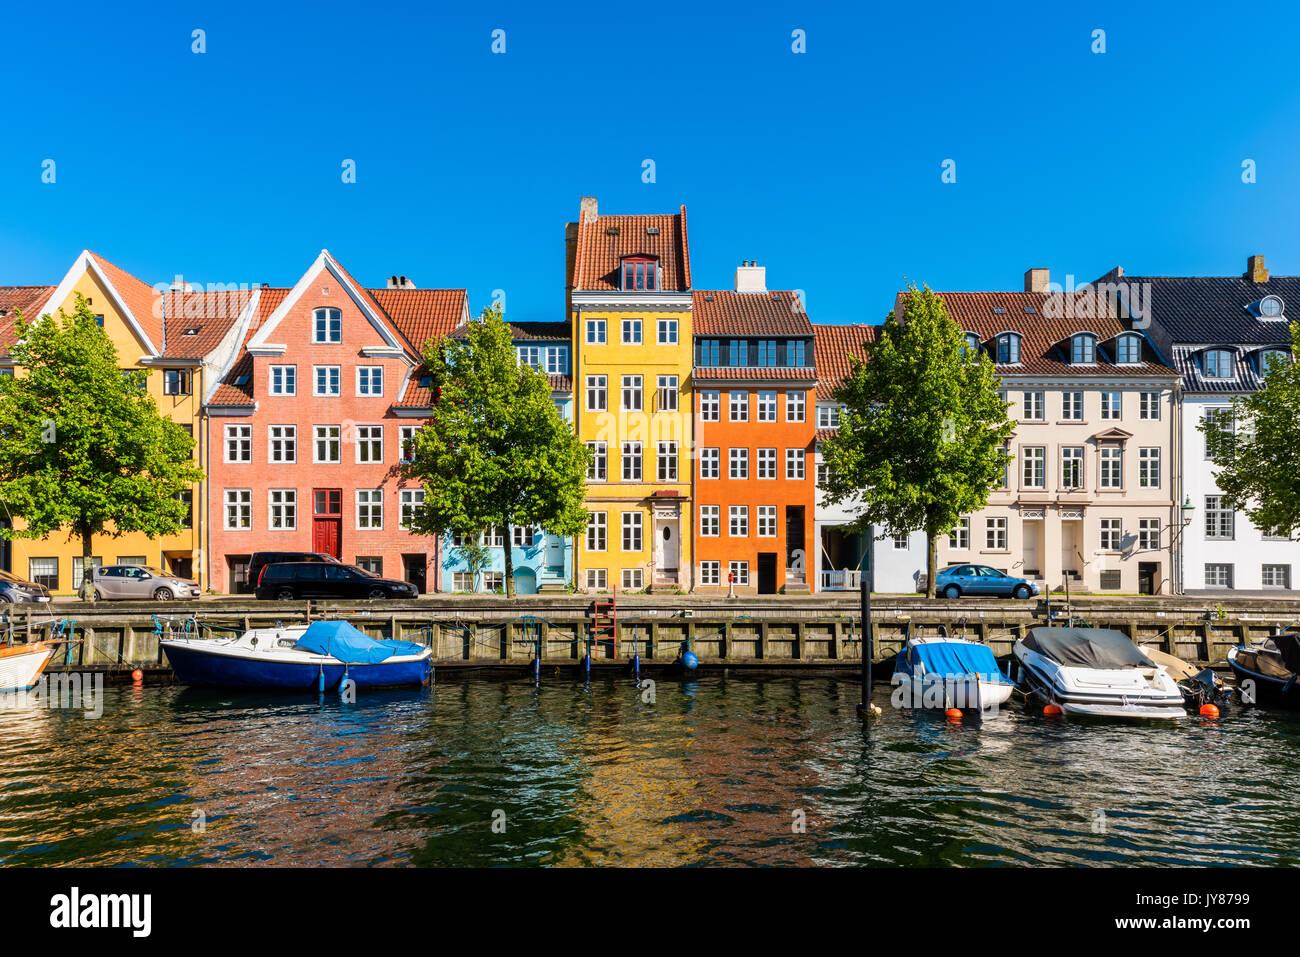 Coloridas casas junto al canal en Copenhague, Dinamarca Imagen De Stock